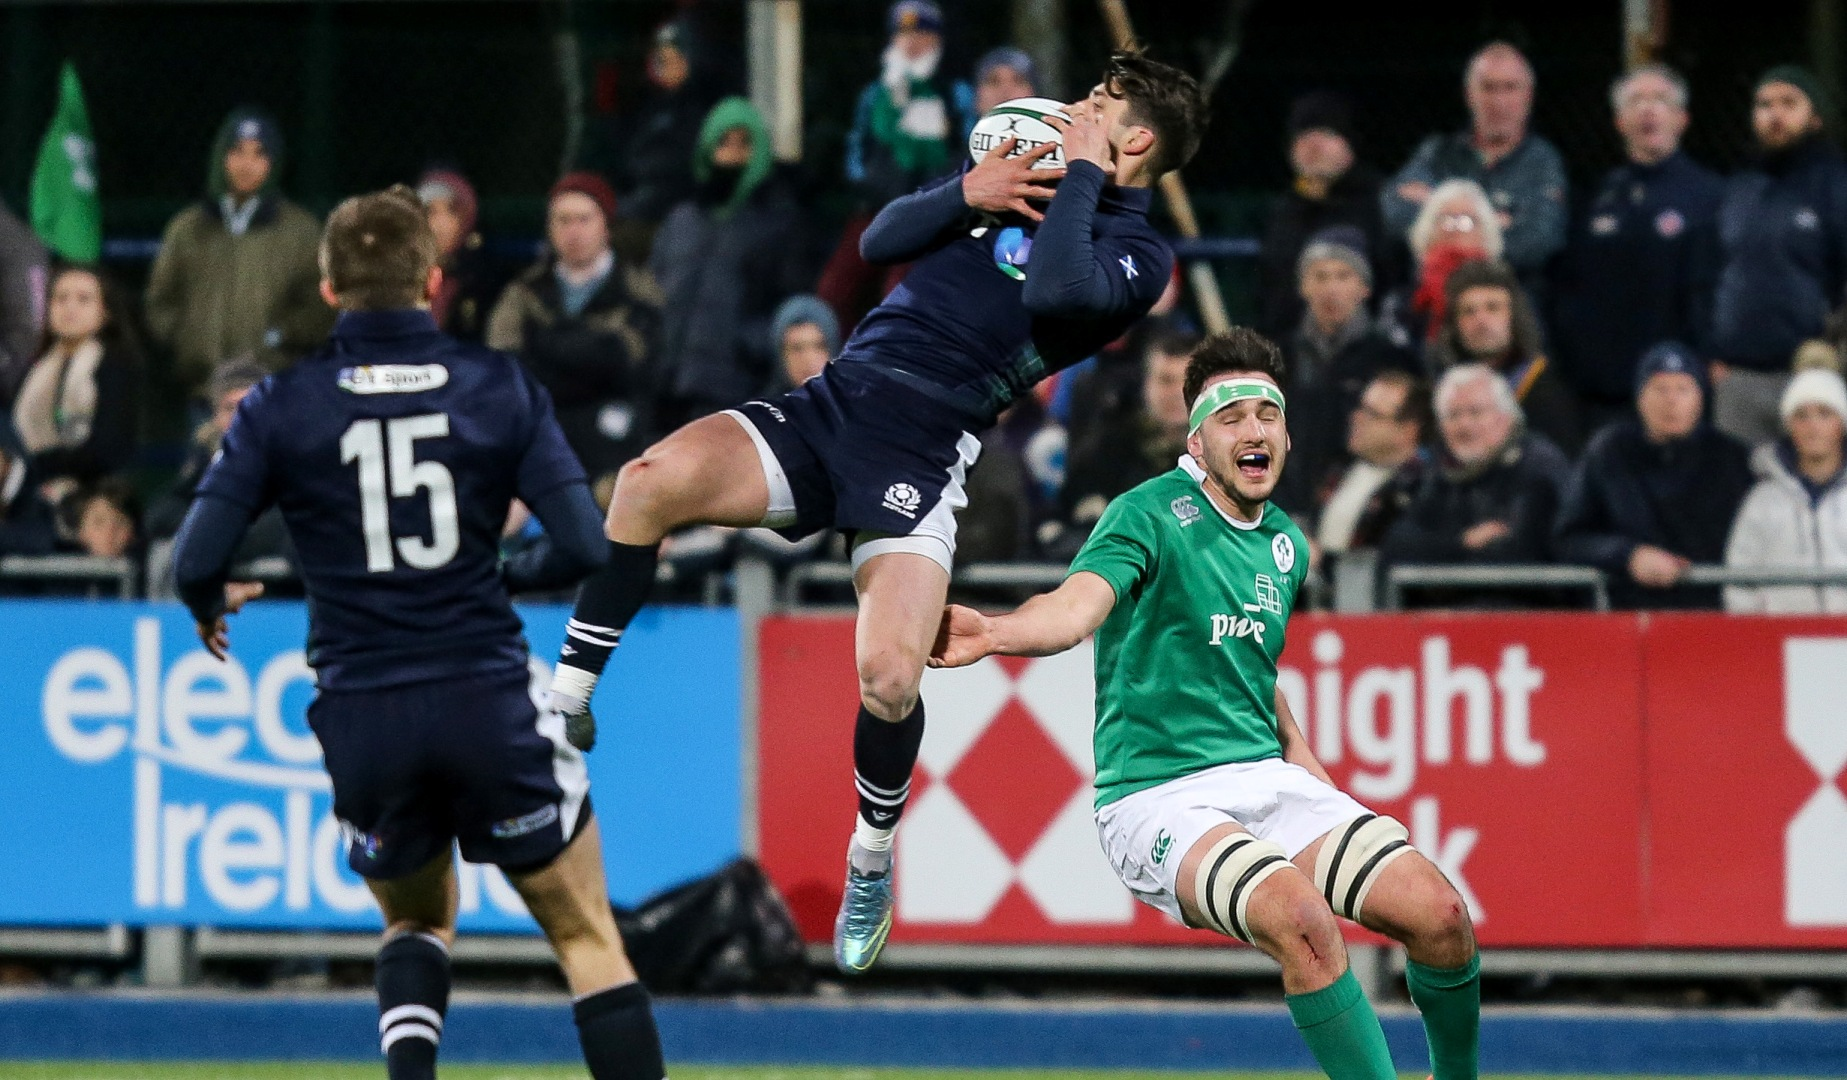 Scotland make dream start to World Rugby U20s Champs